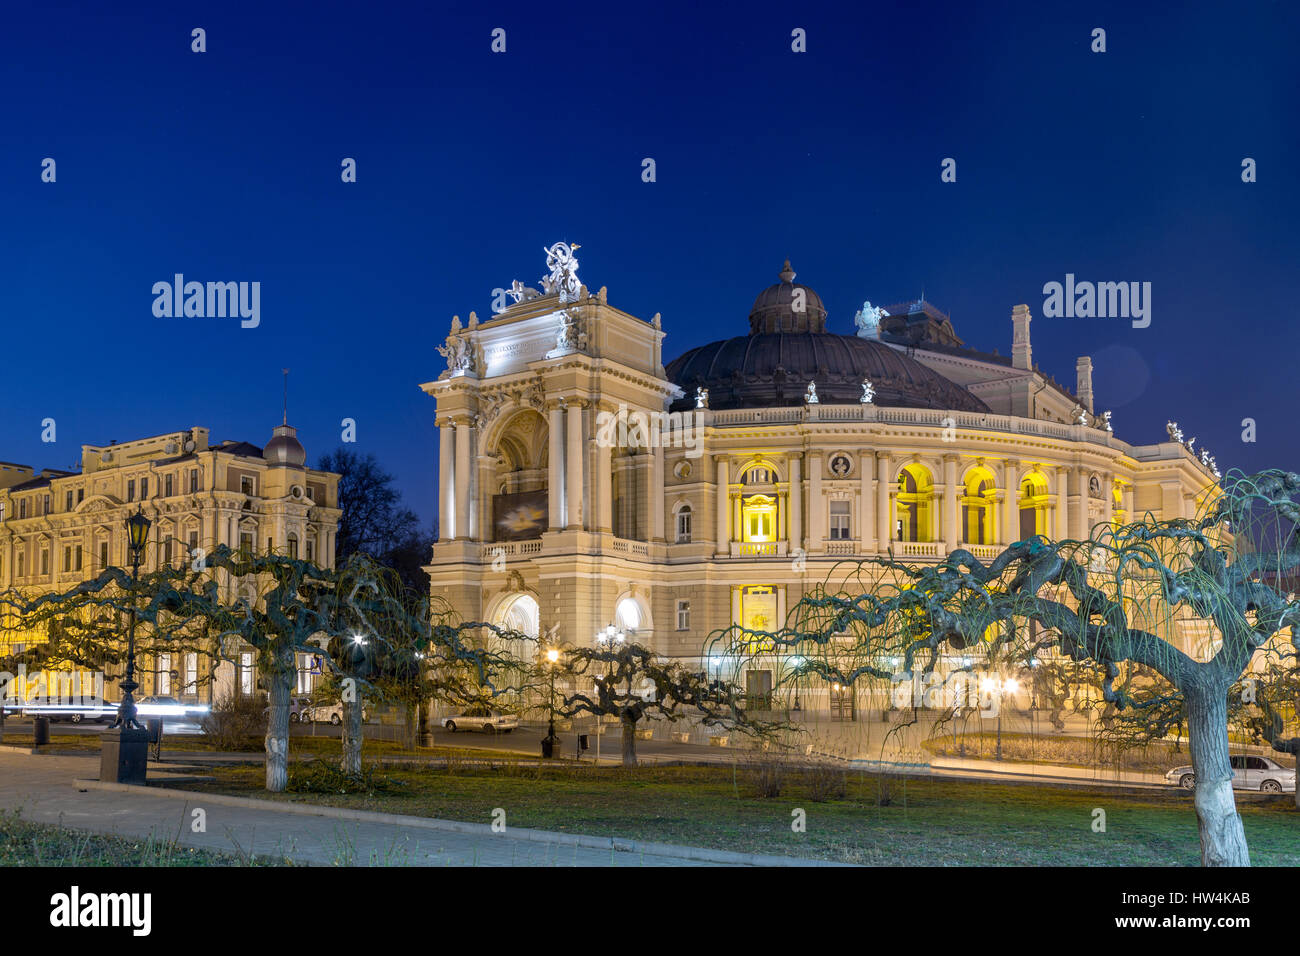 Odessa Opera and Ballet Theater in the heart of Odessa, Ukraine at night - Stock Image